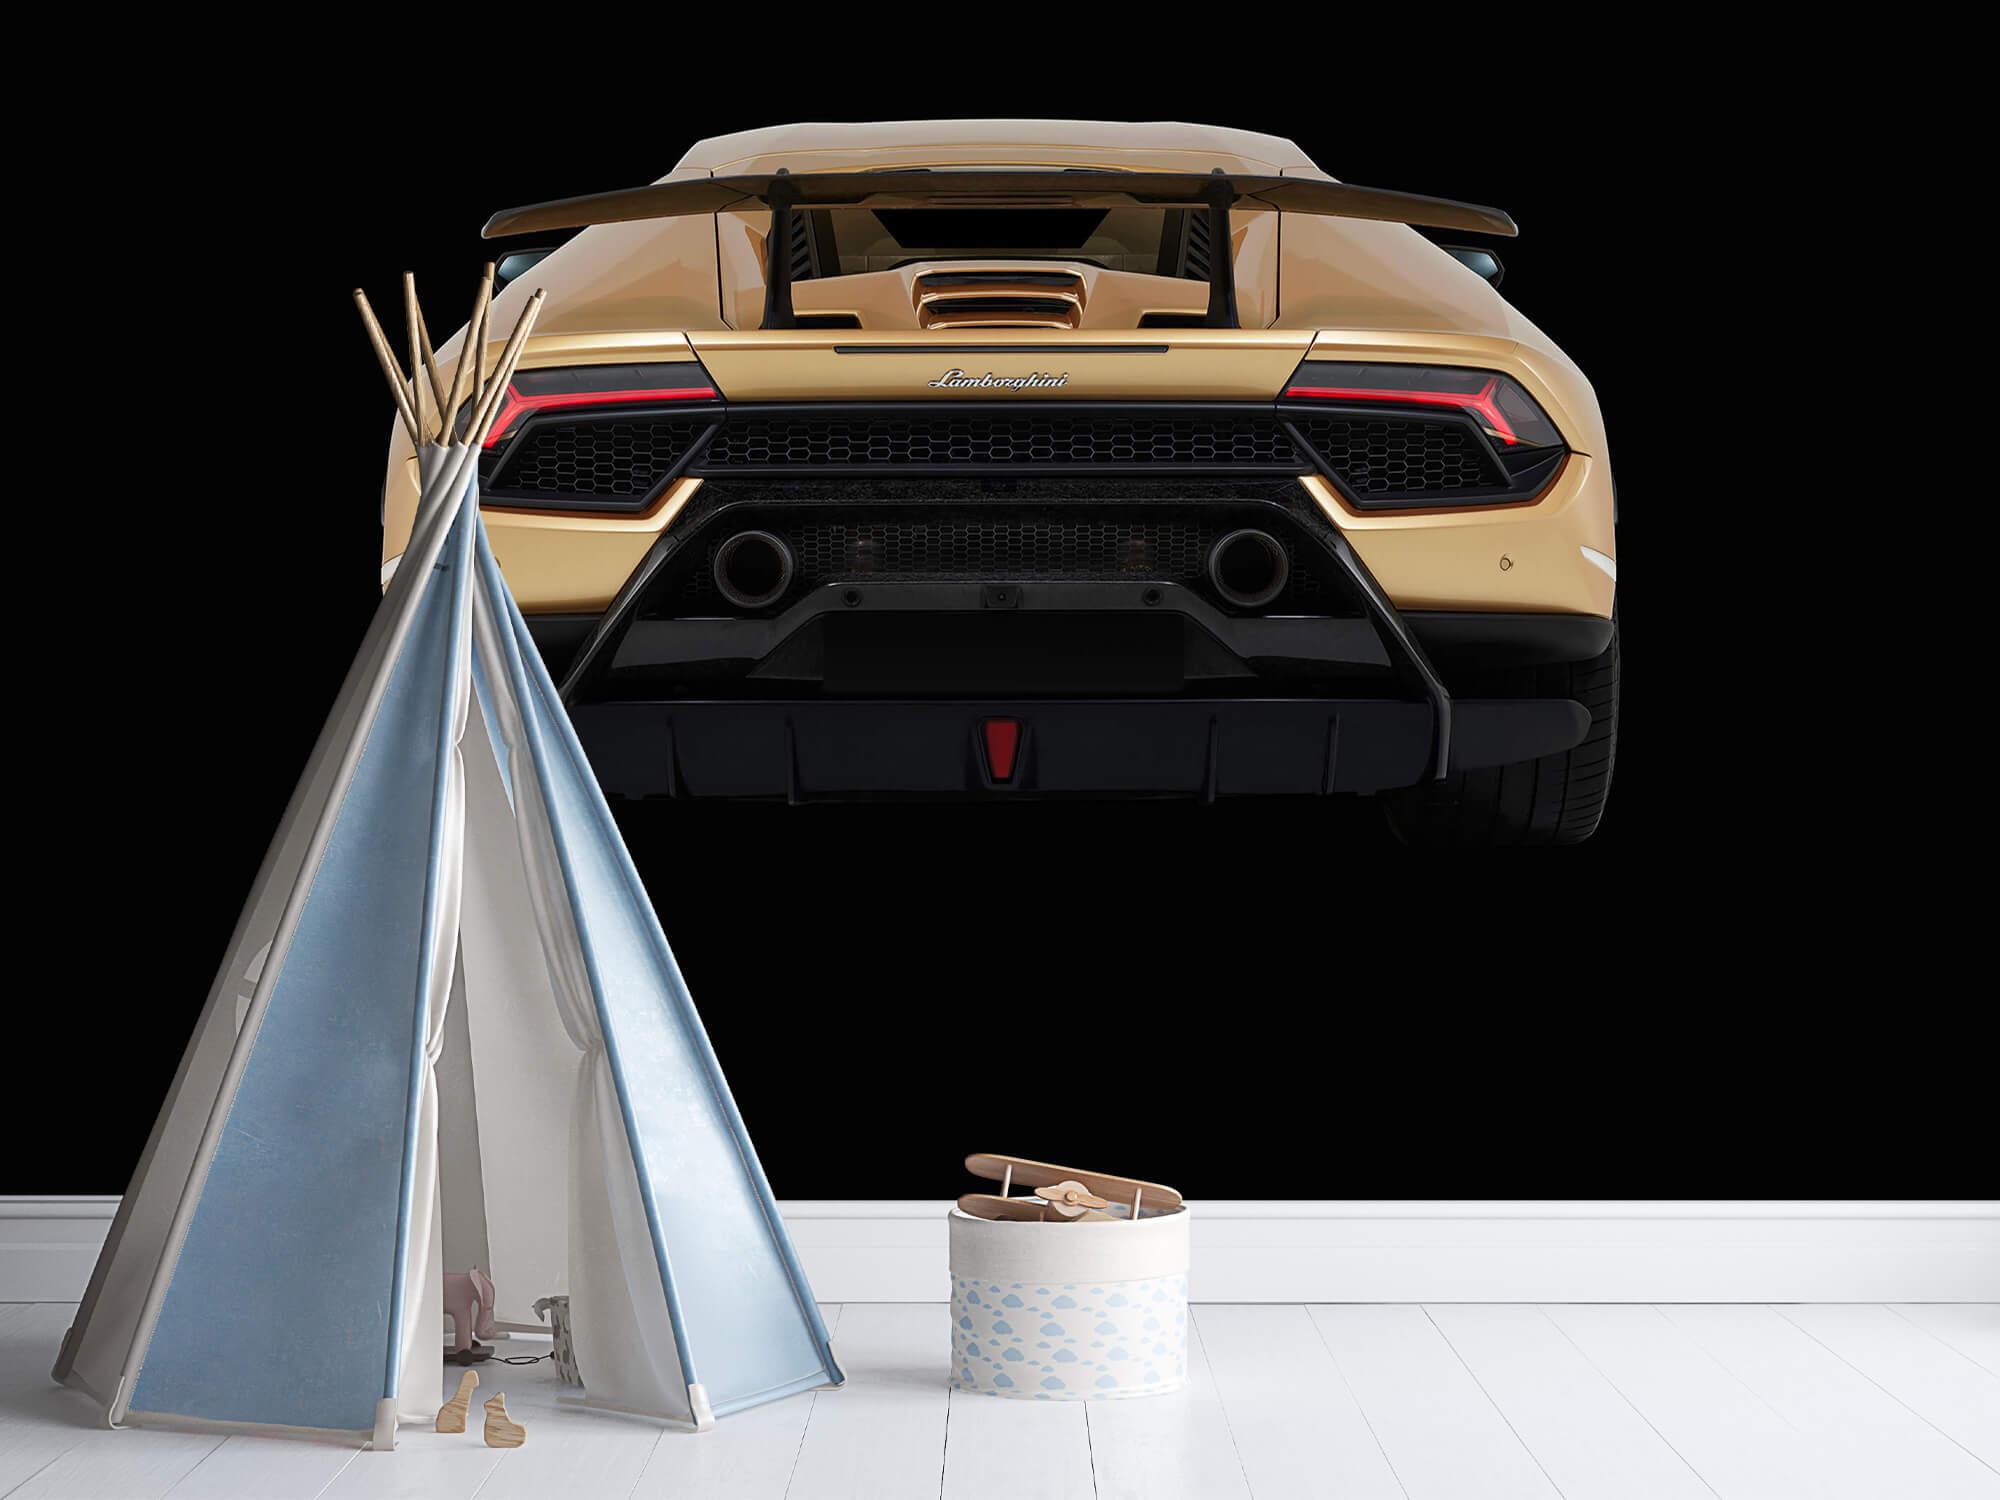 Wallpaper Lamborghini Huracán - Rear view, black 7